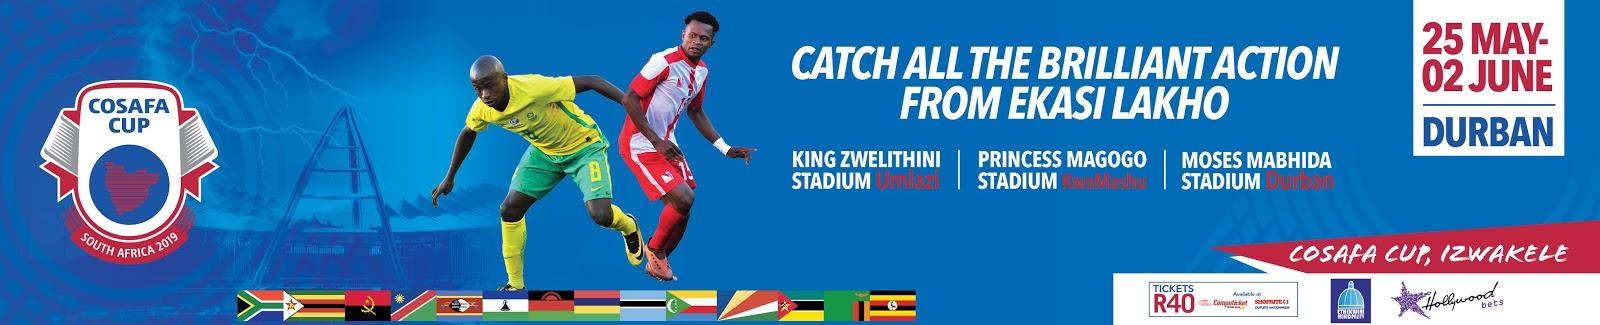 COSAFA Cup 2019 - Durban - 25 May to 2 June 2019